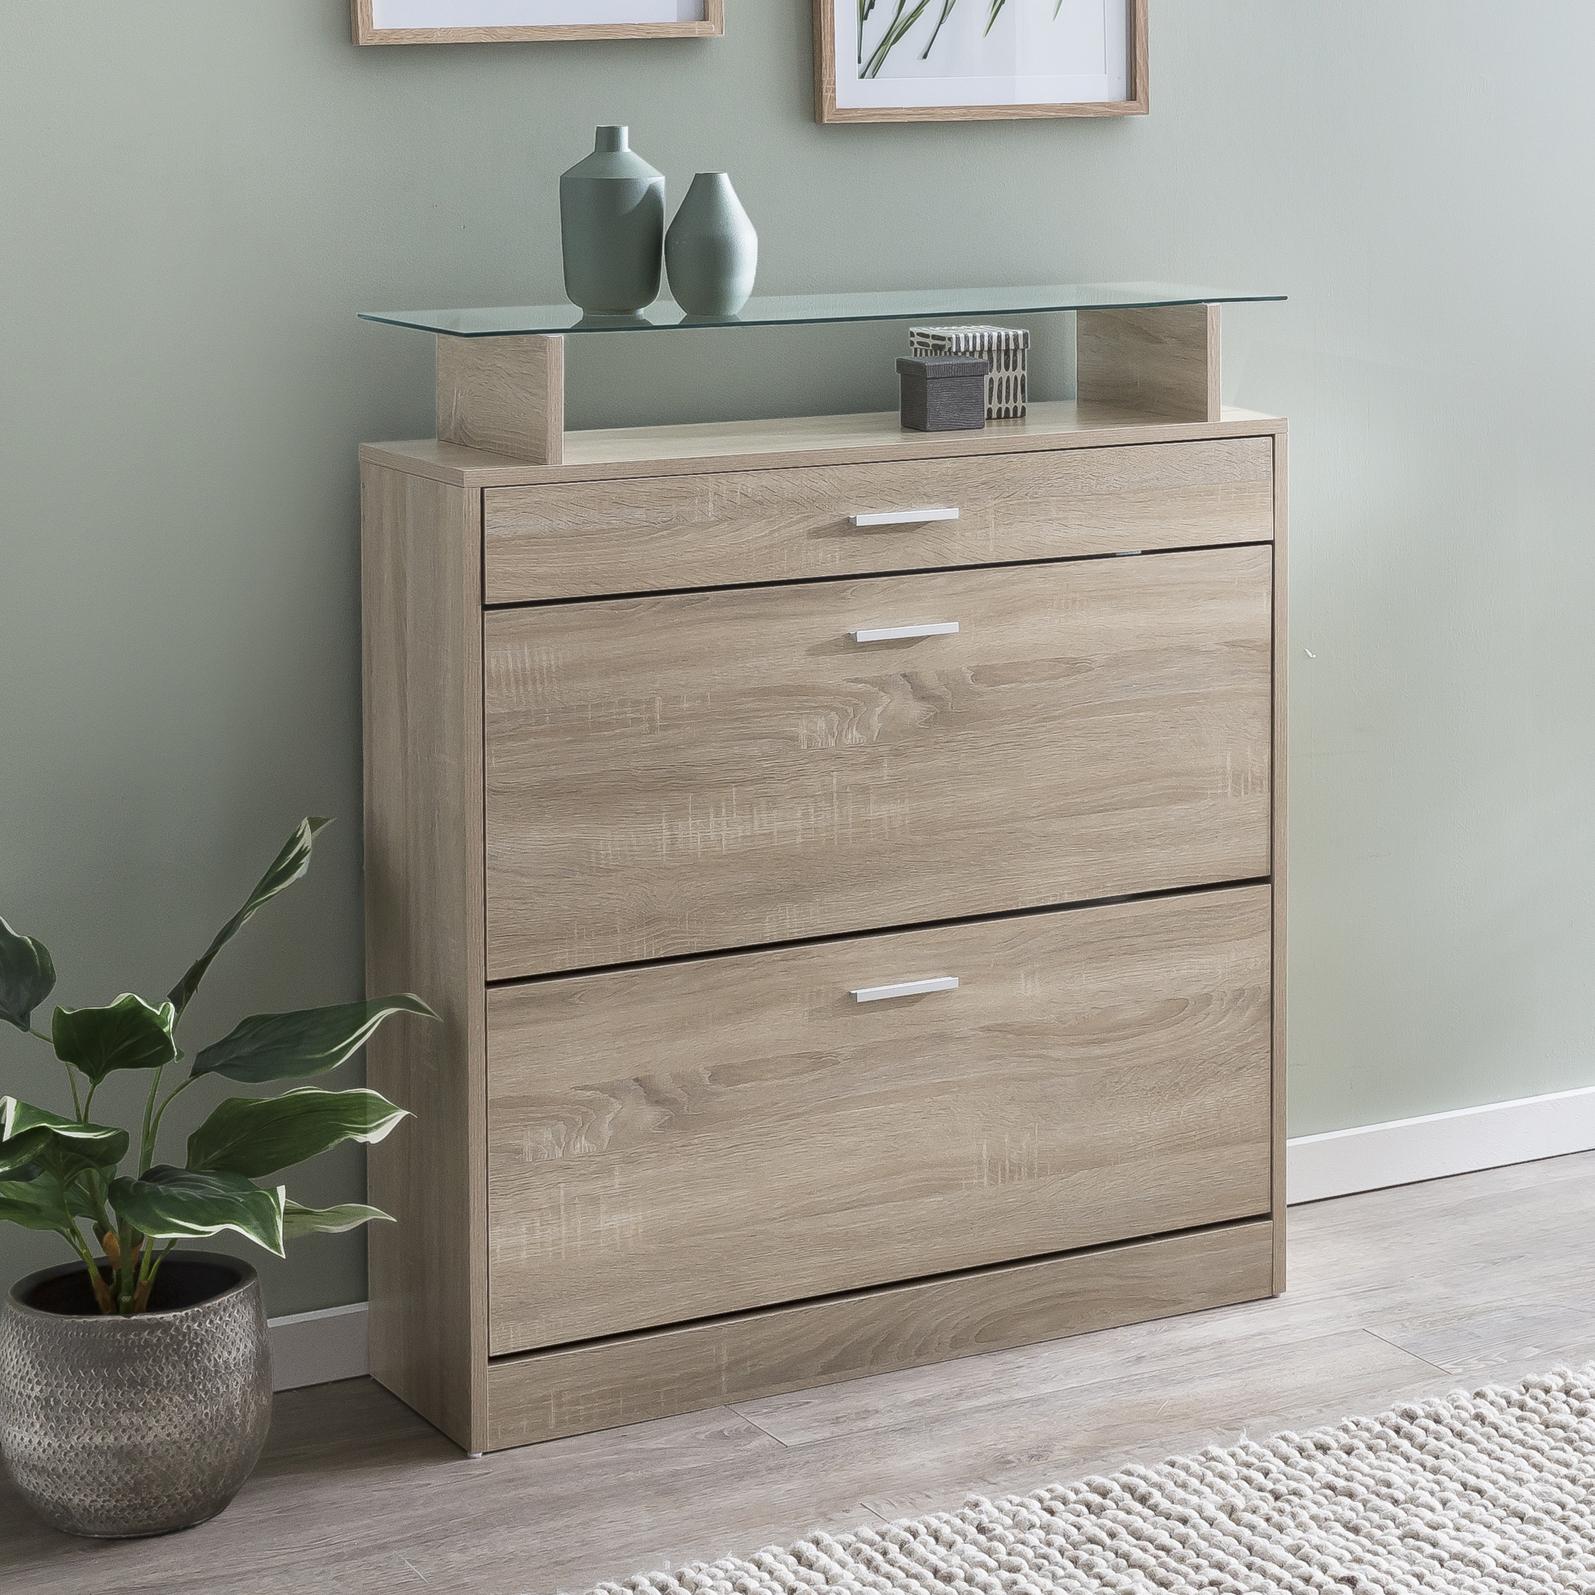 finebuy schuhkipper schuhschrank schmal schuhkommode holz schuhregal hoch ebay. Black Bedroom Furniture Sets. Home Design Ideas